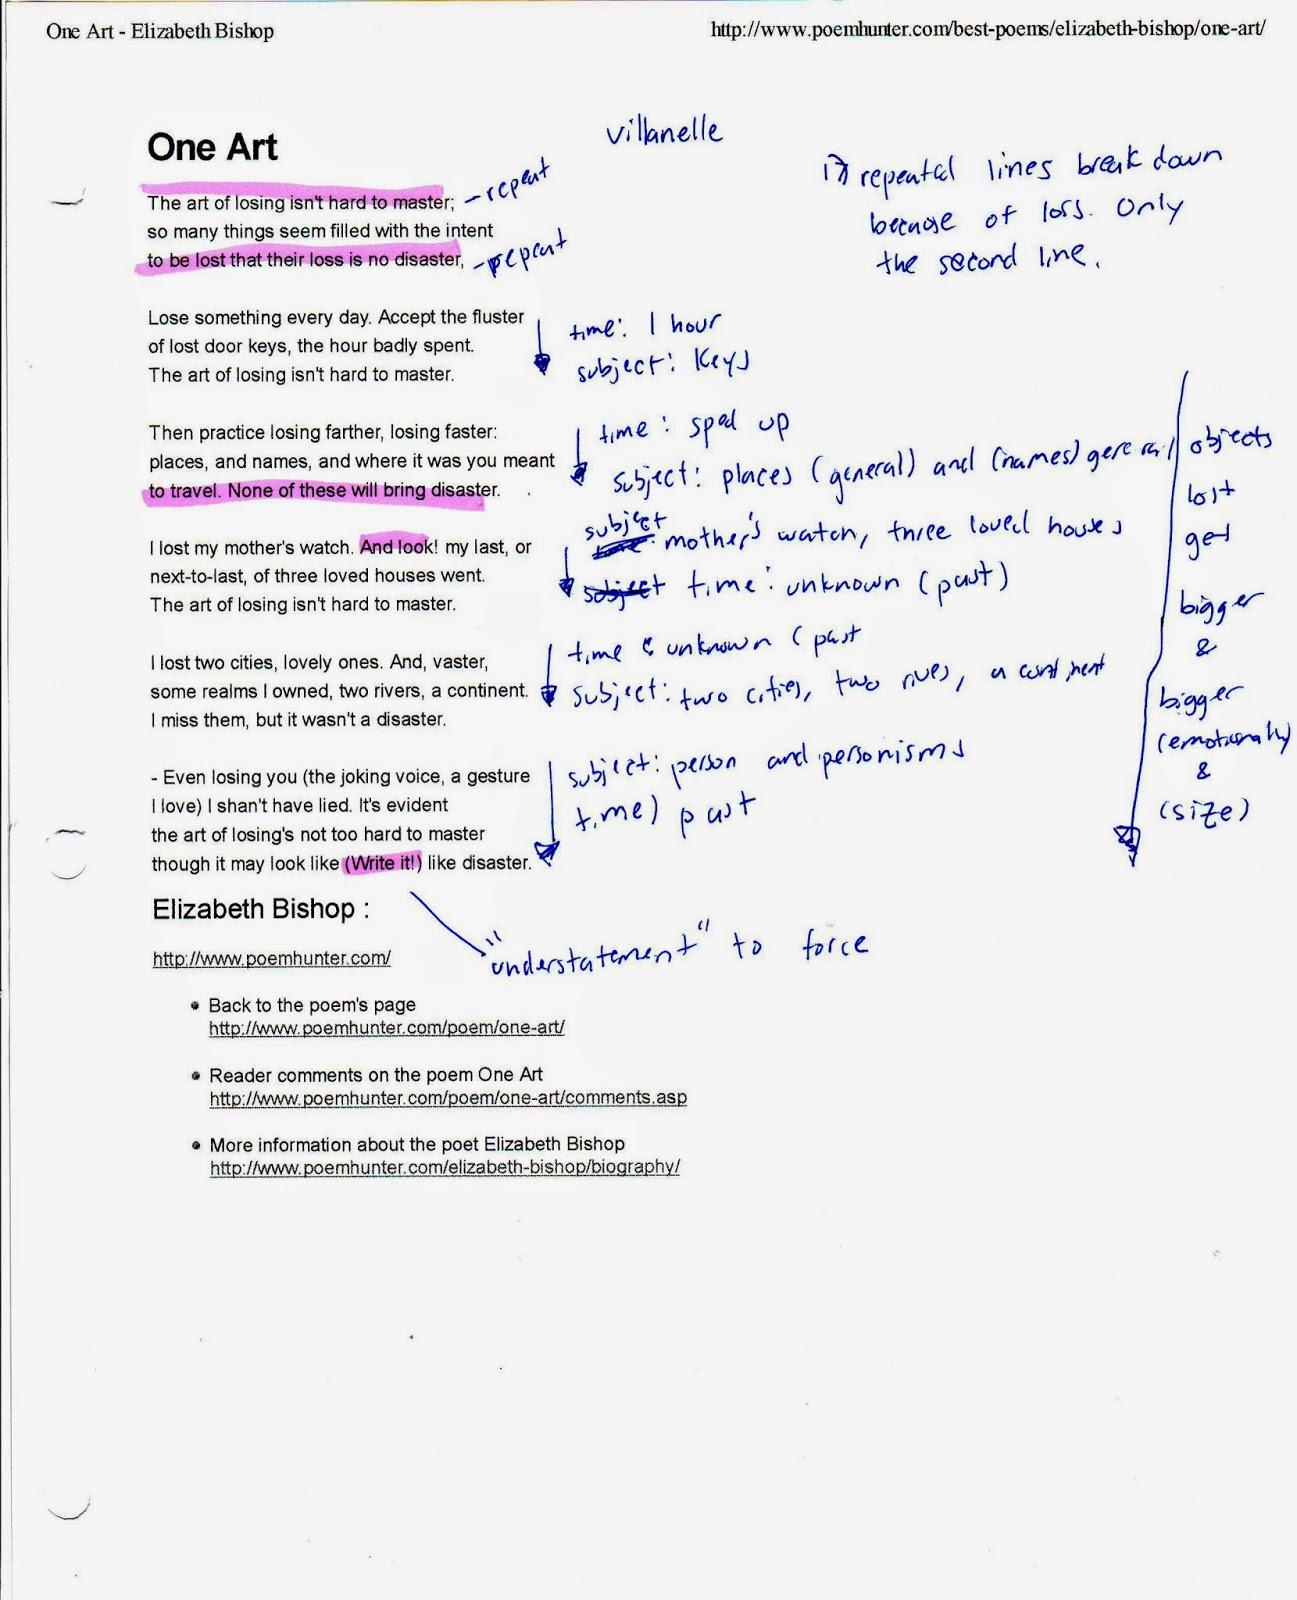 Scholarship essay questions